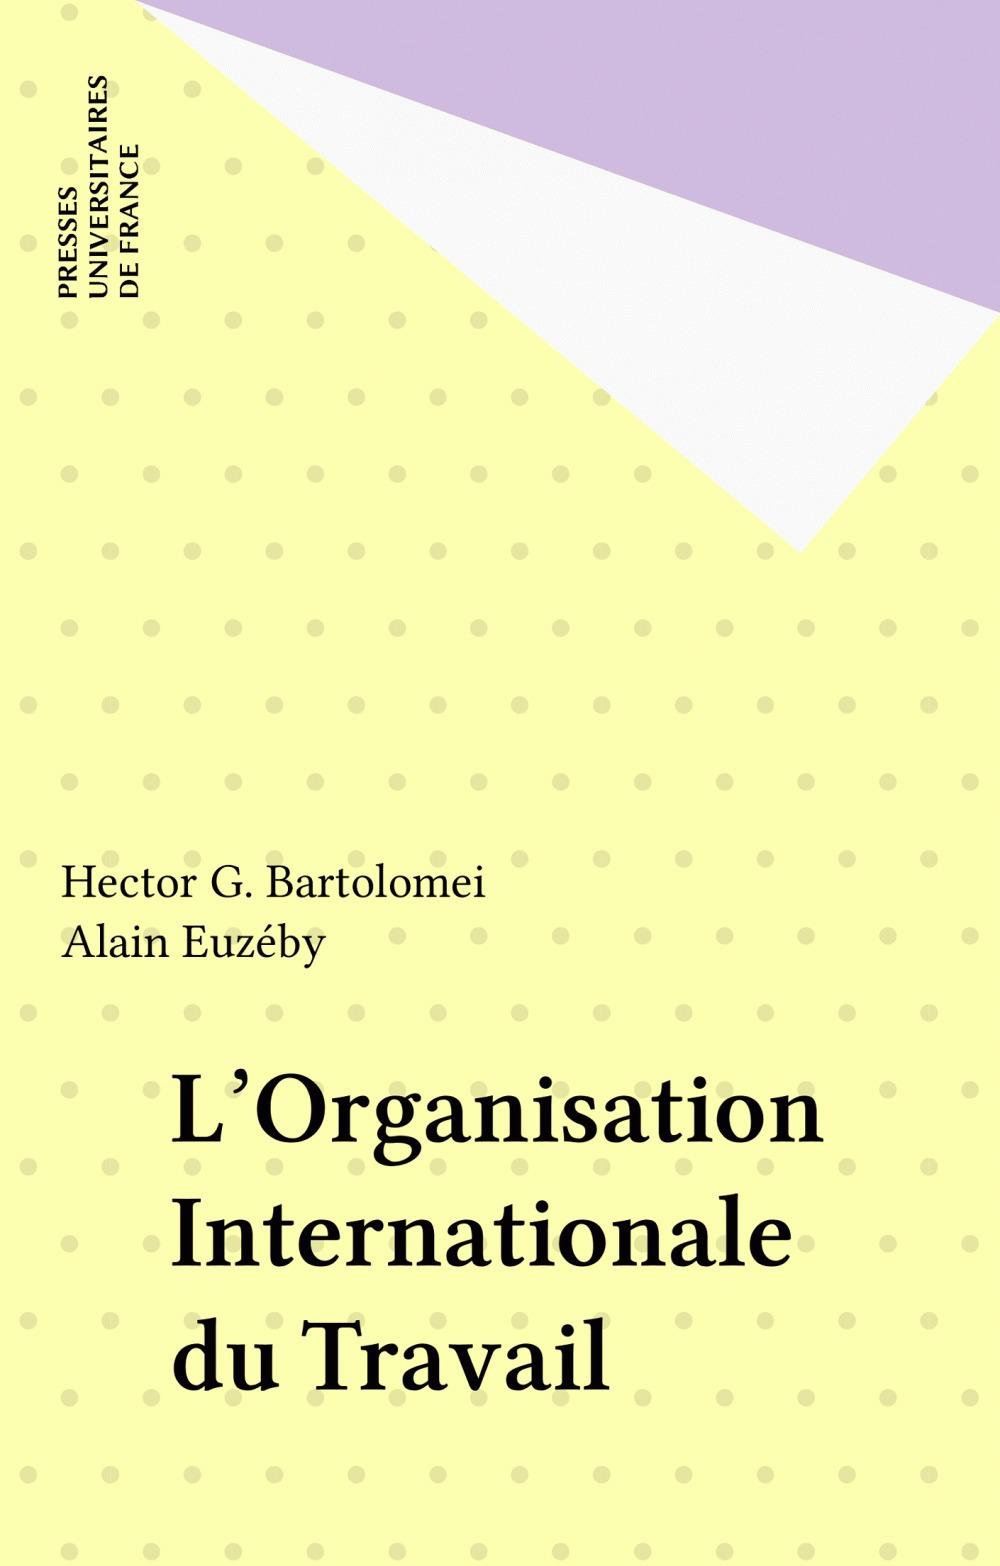 L'organisation internationale travail (OIT)